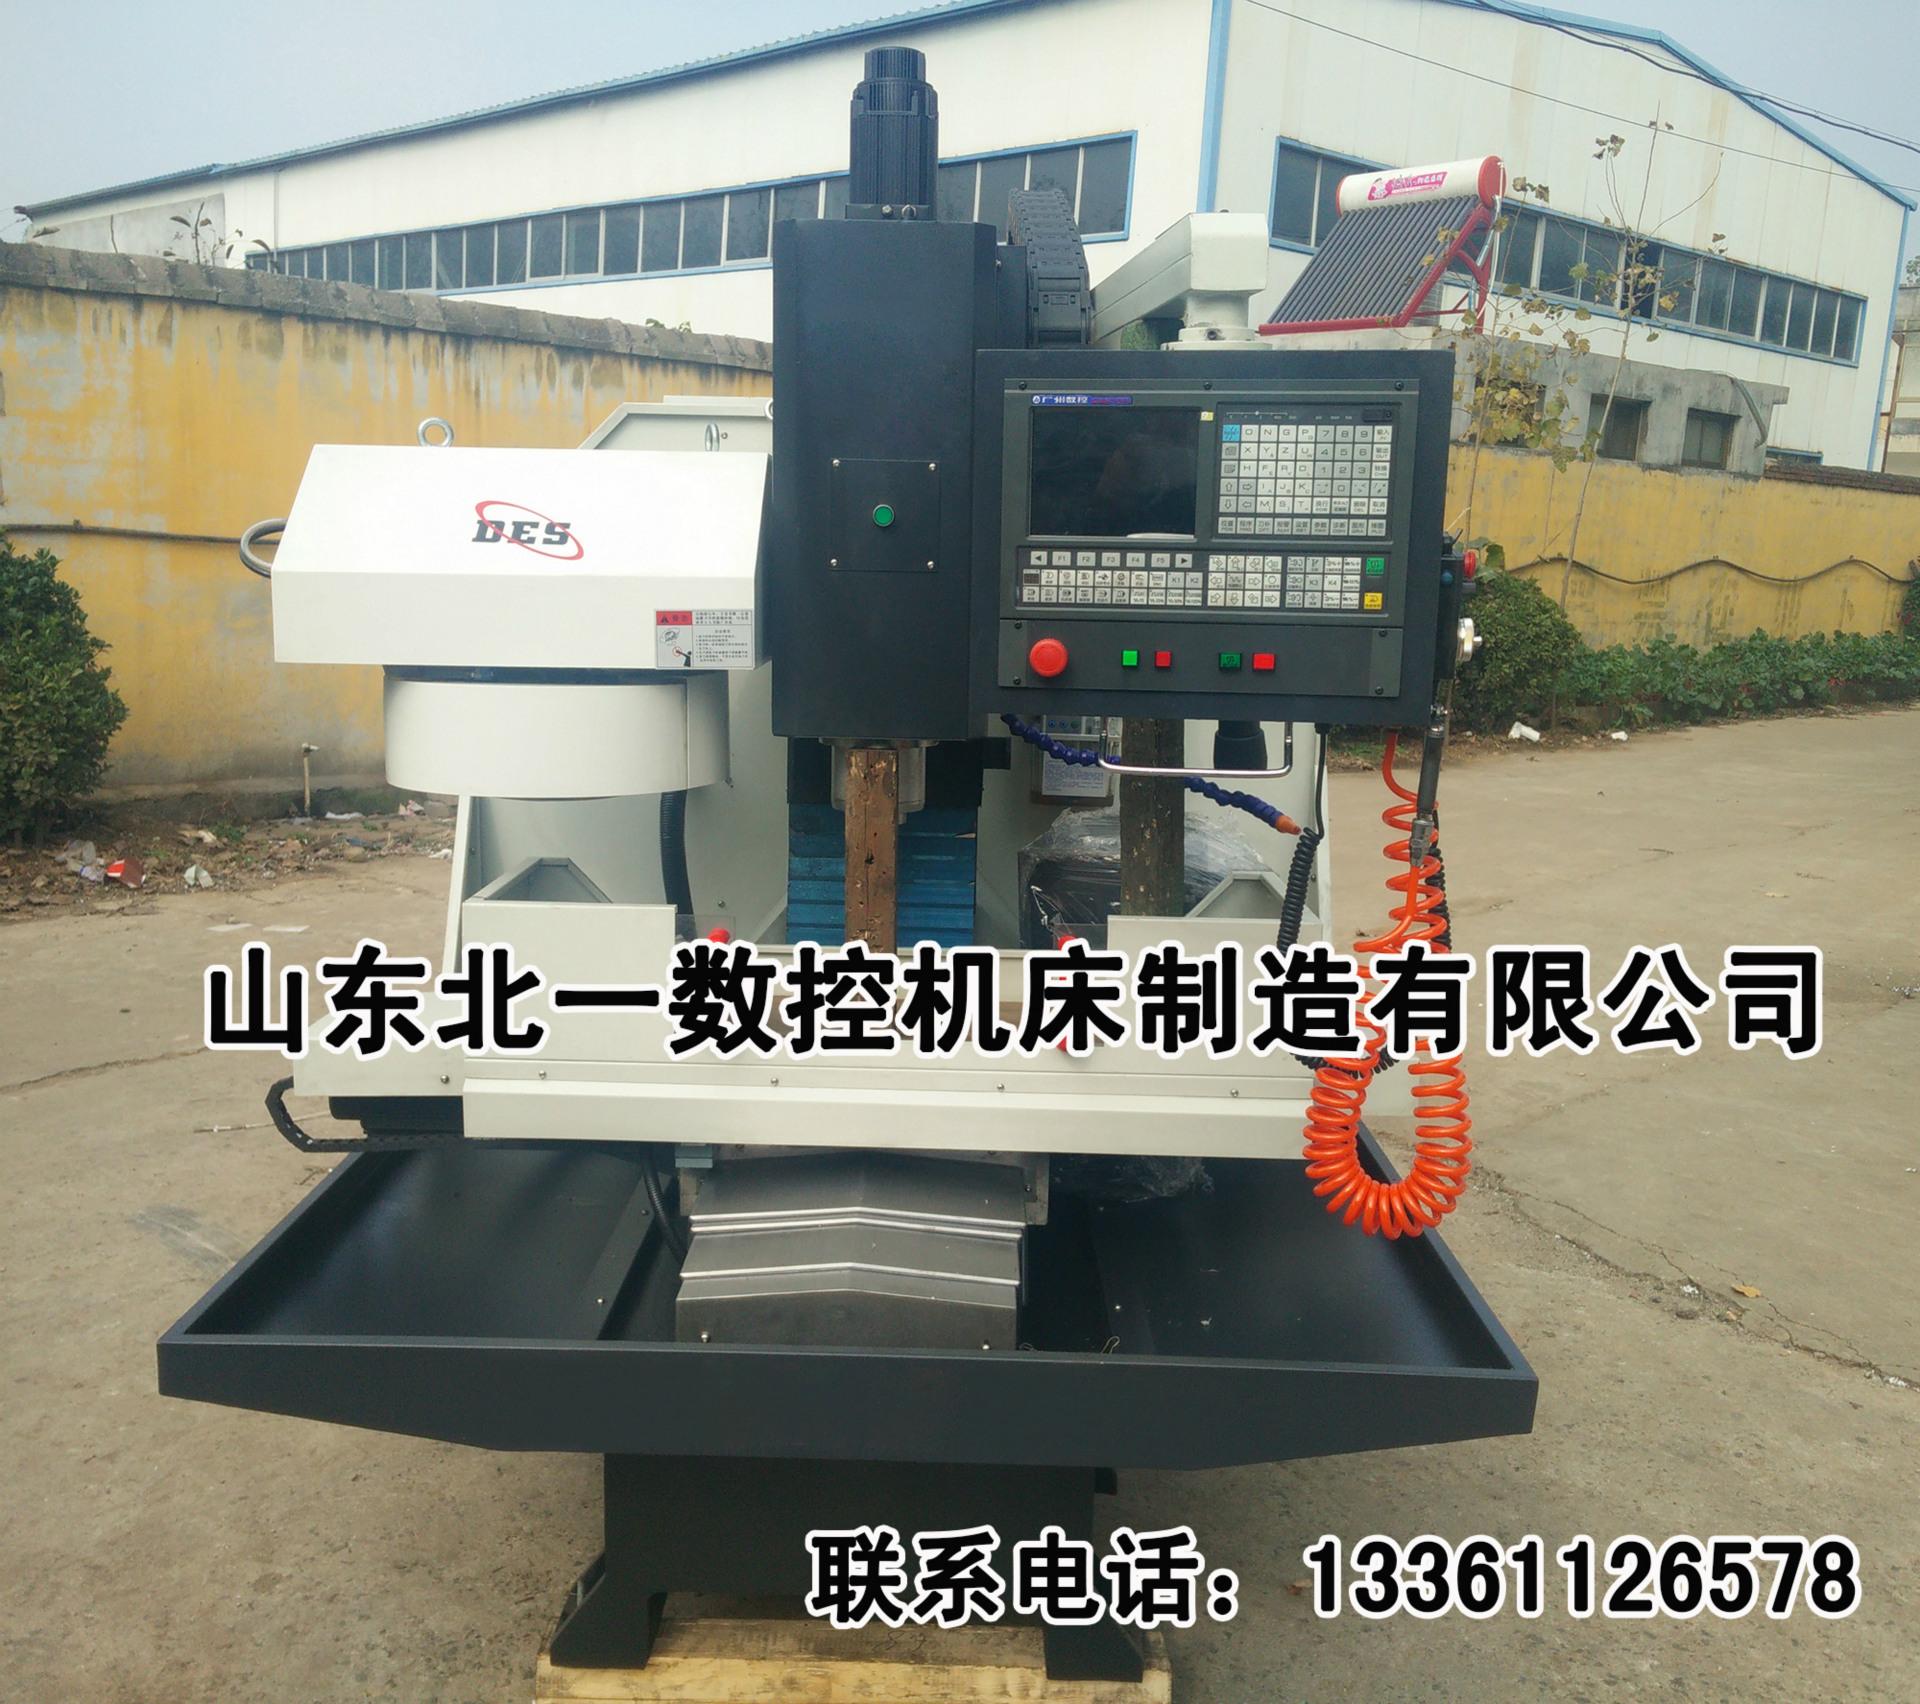 XH7126加工中心